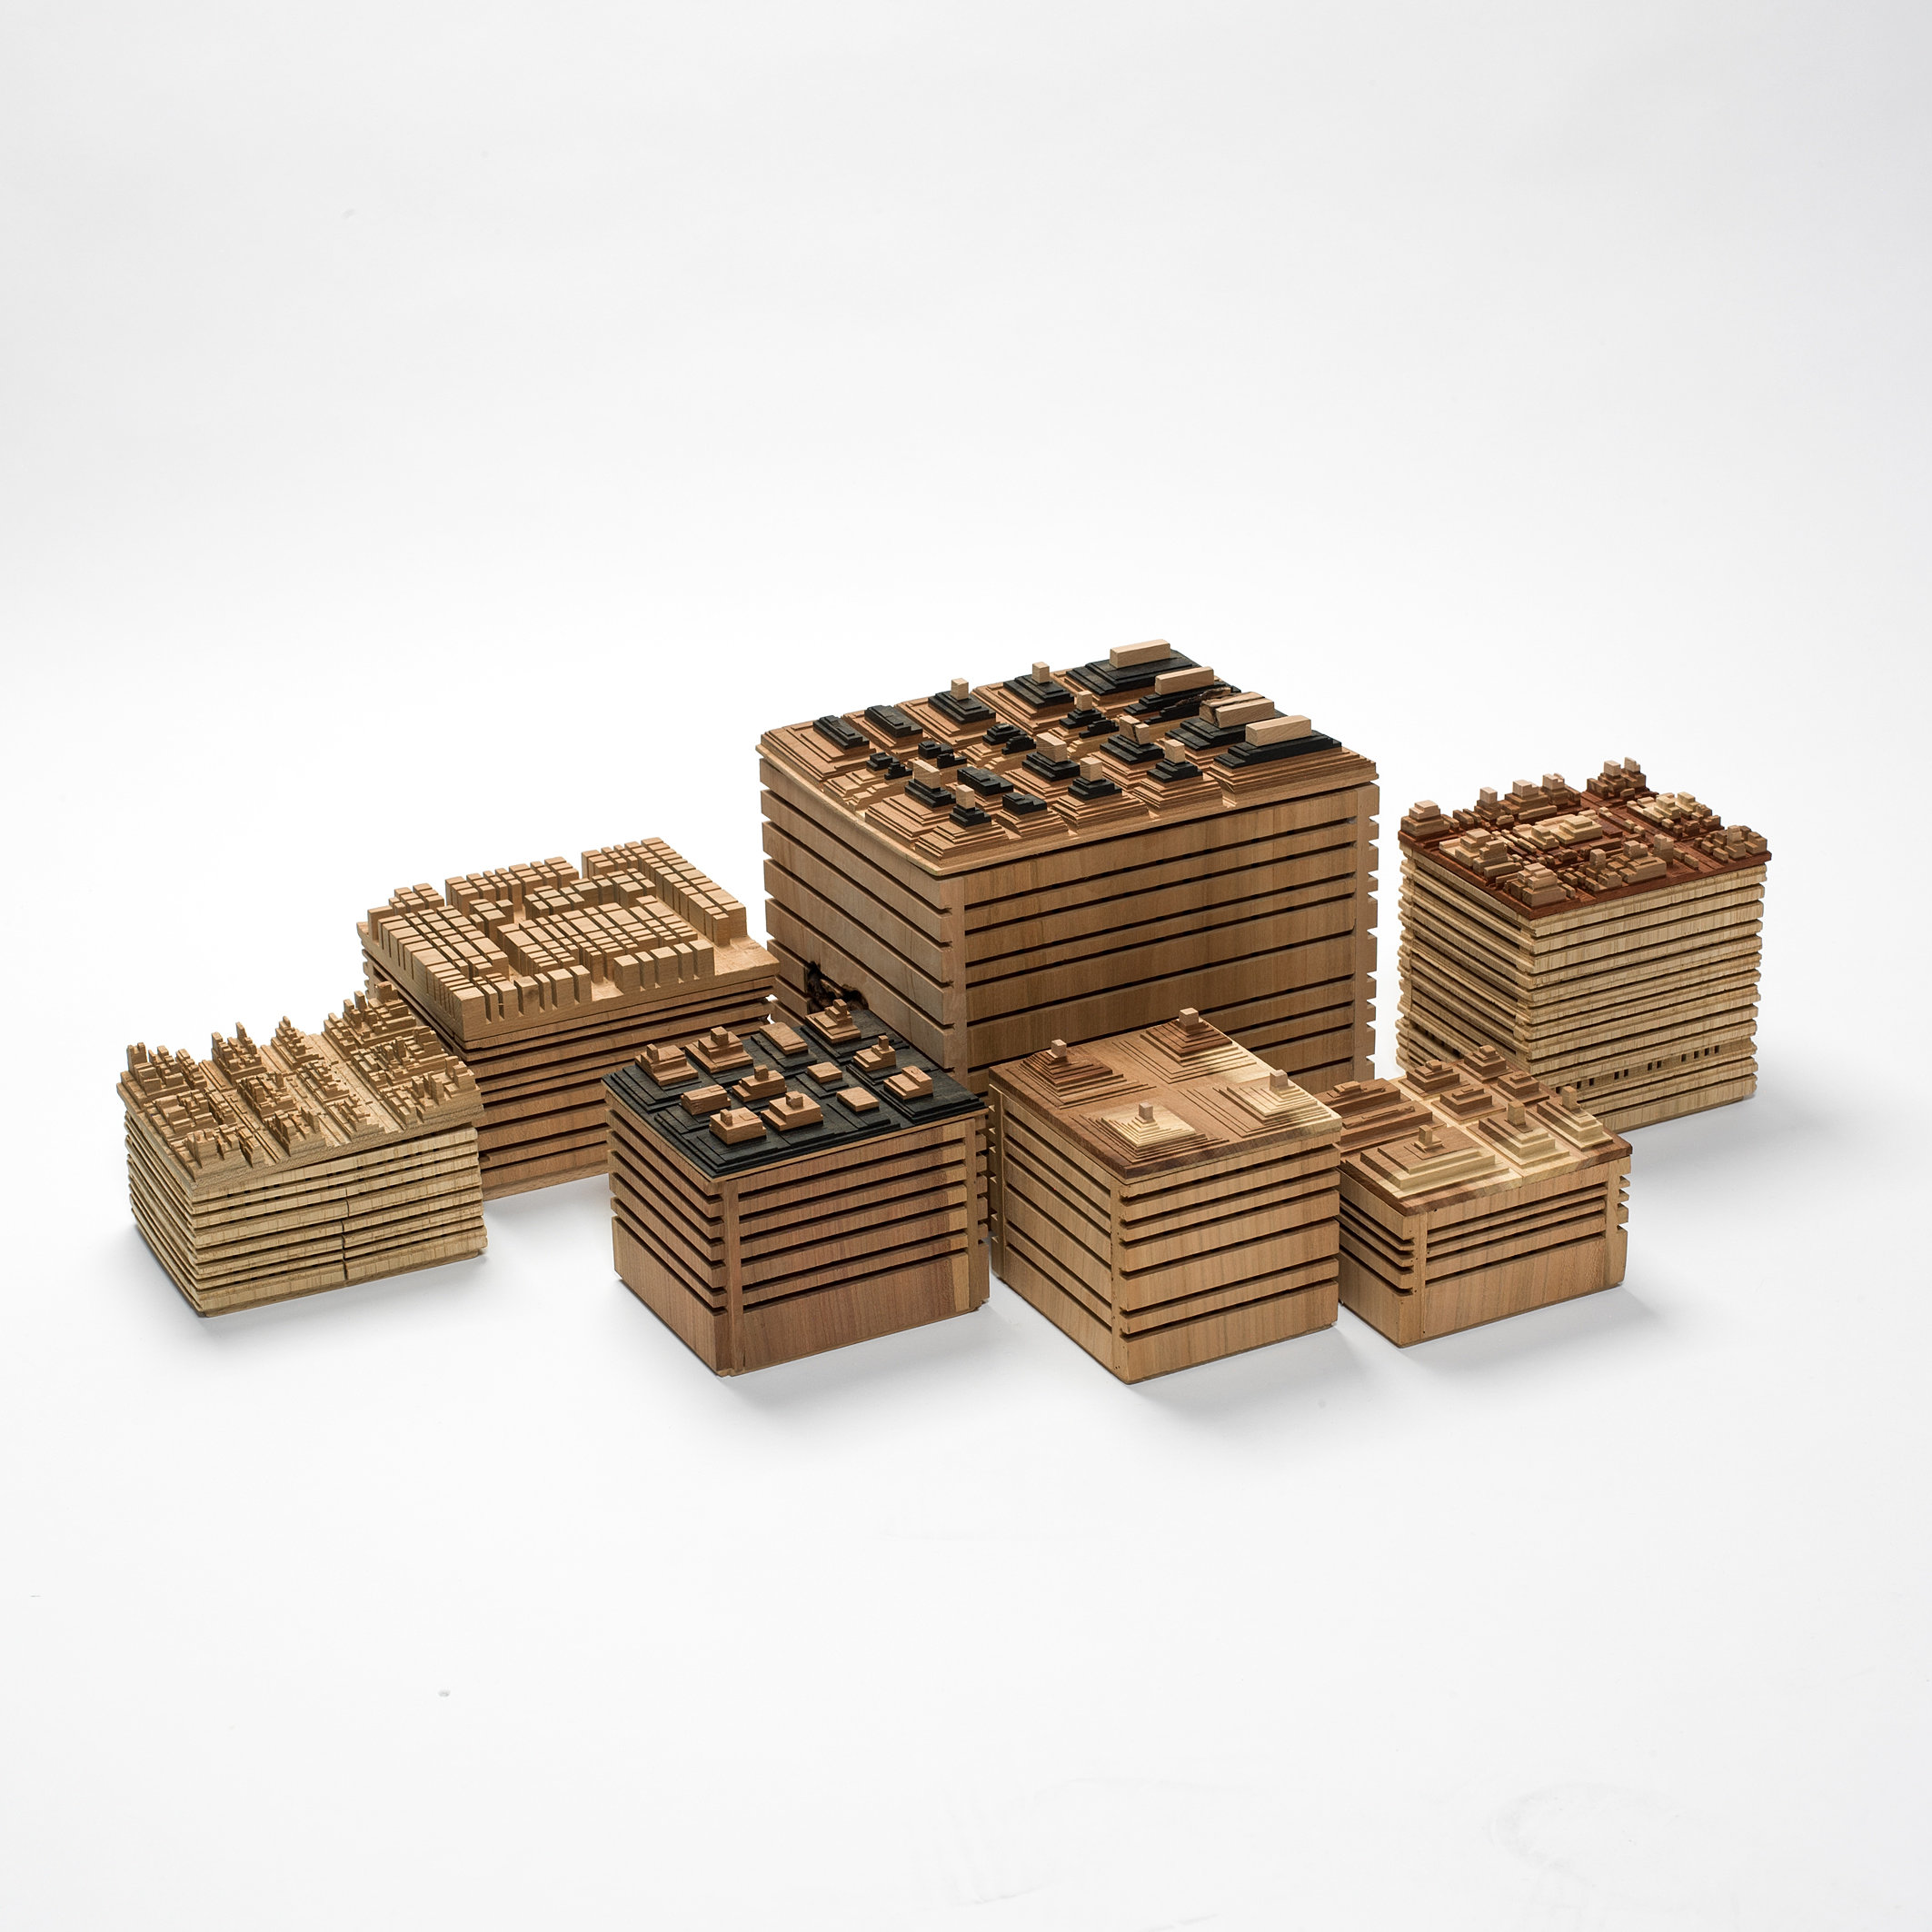 cr ation de luminaire en bois france gilles ansel boite en bois design. Black Bedroom Furniture Sets. Home Design Ideas